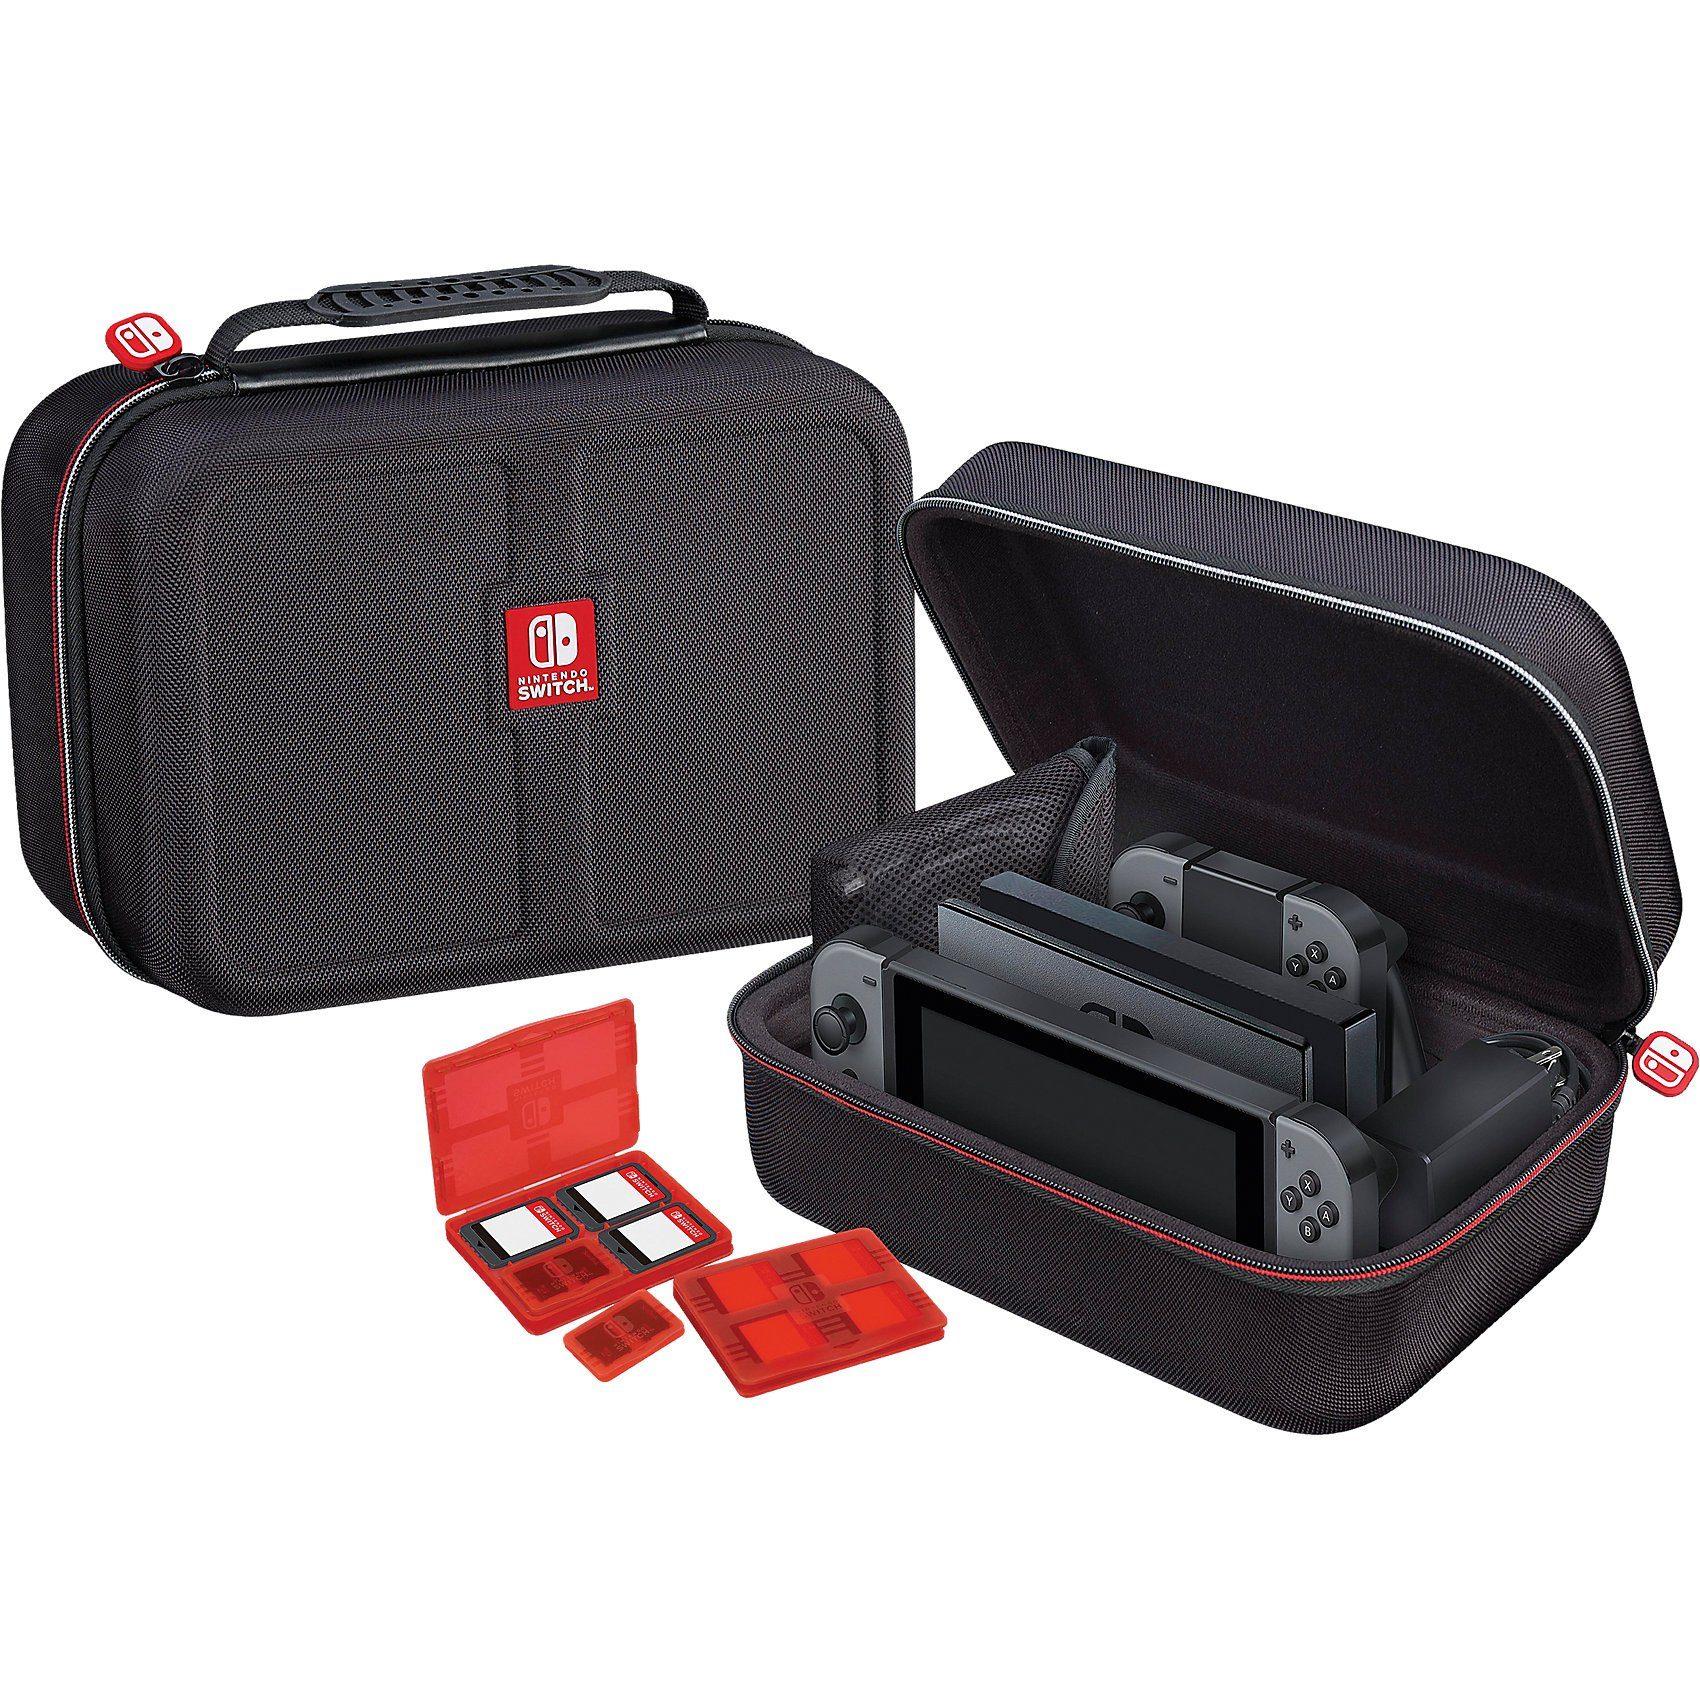 BigBen Switch Tasche Deluxe Case - Offiziell lizenziert [black]